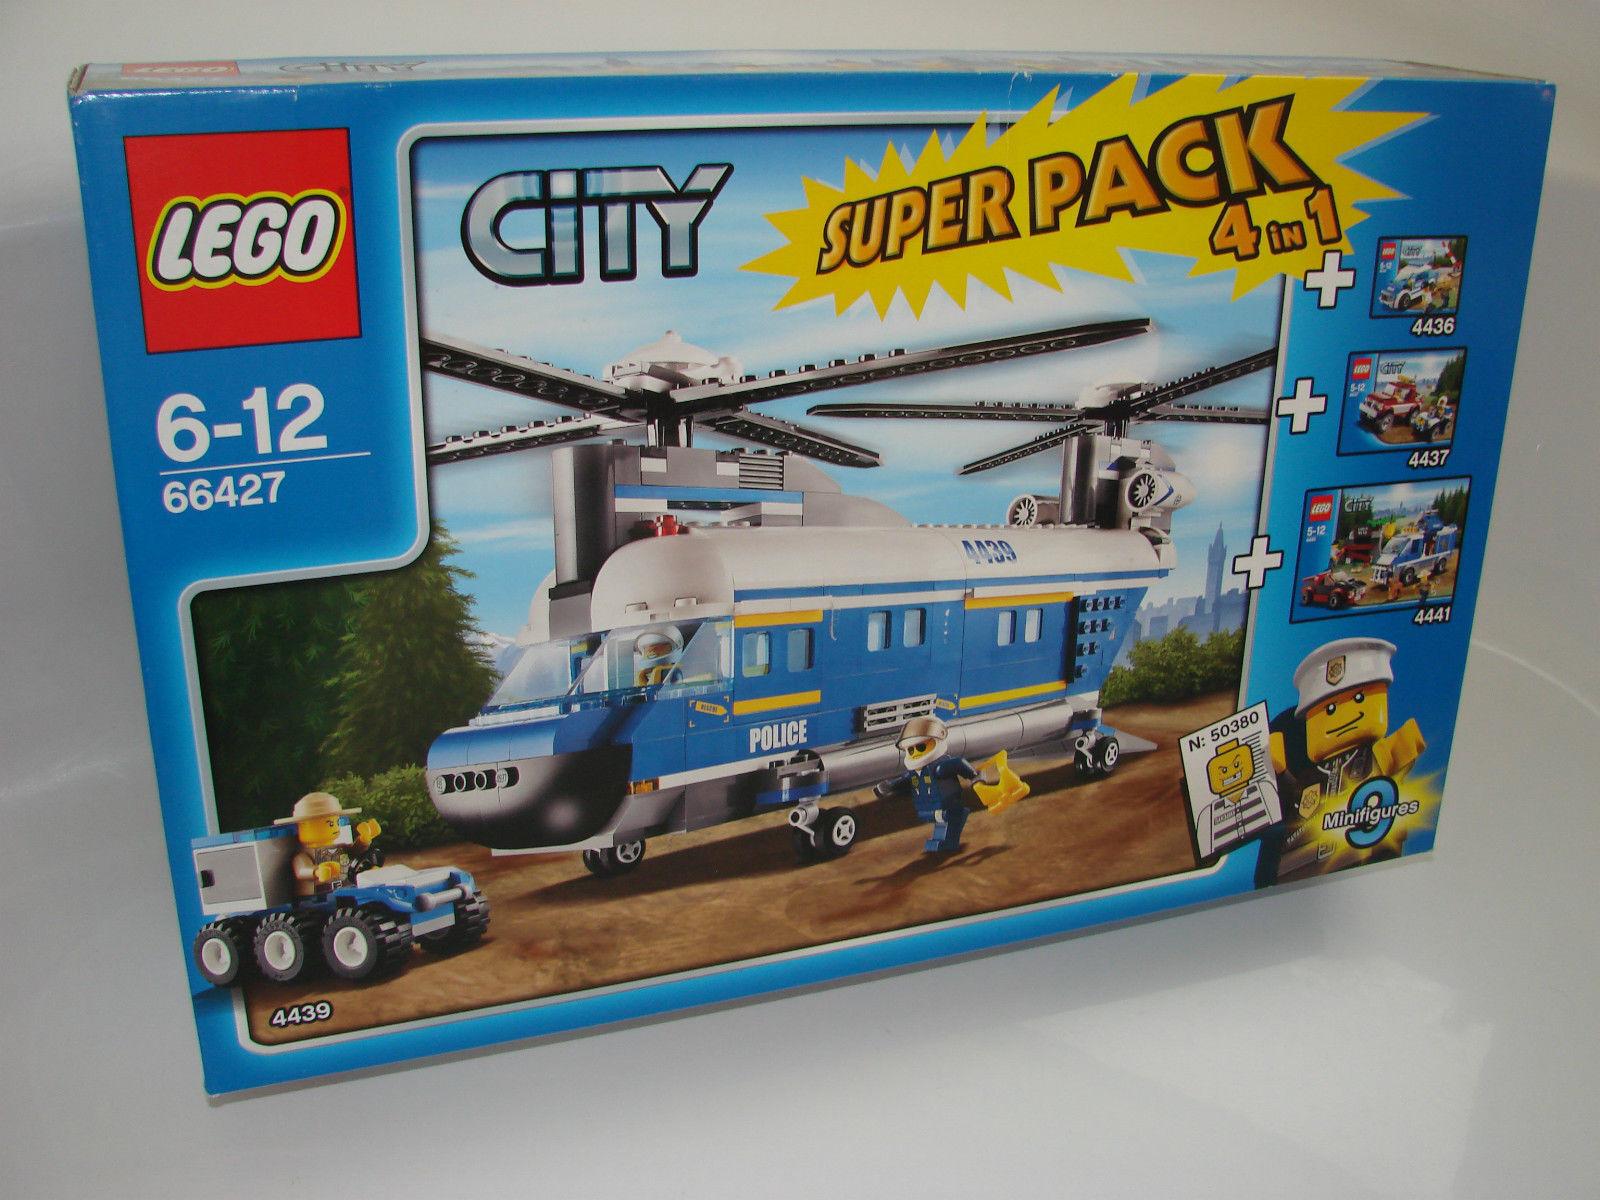 LEGO® CITY 66427 Polizei Superpack Neu OVP _Police NEW MISB NRFB